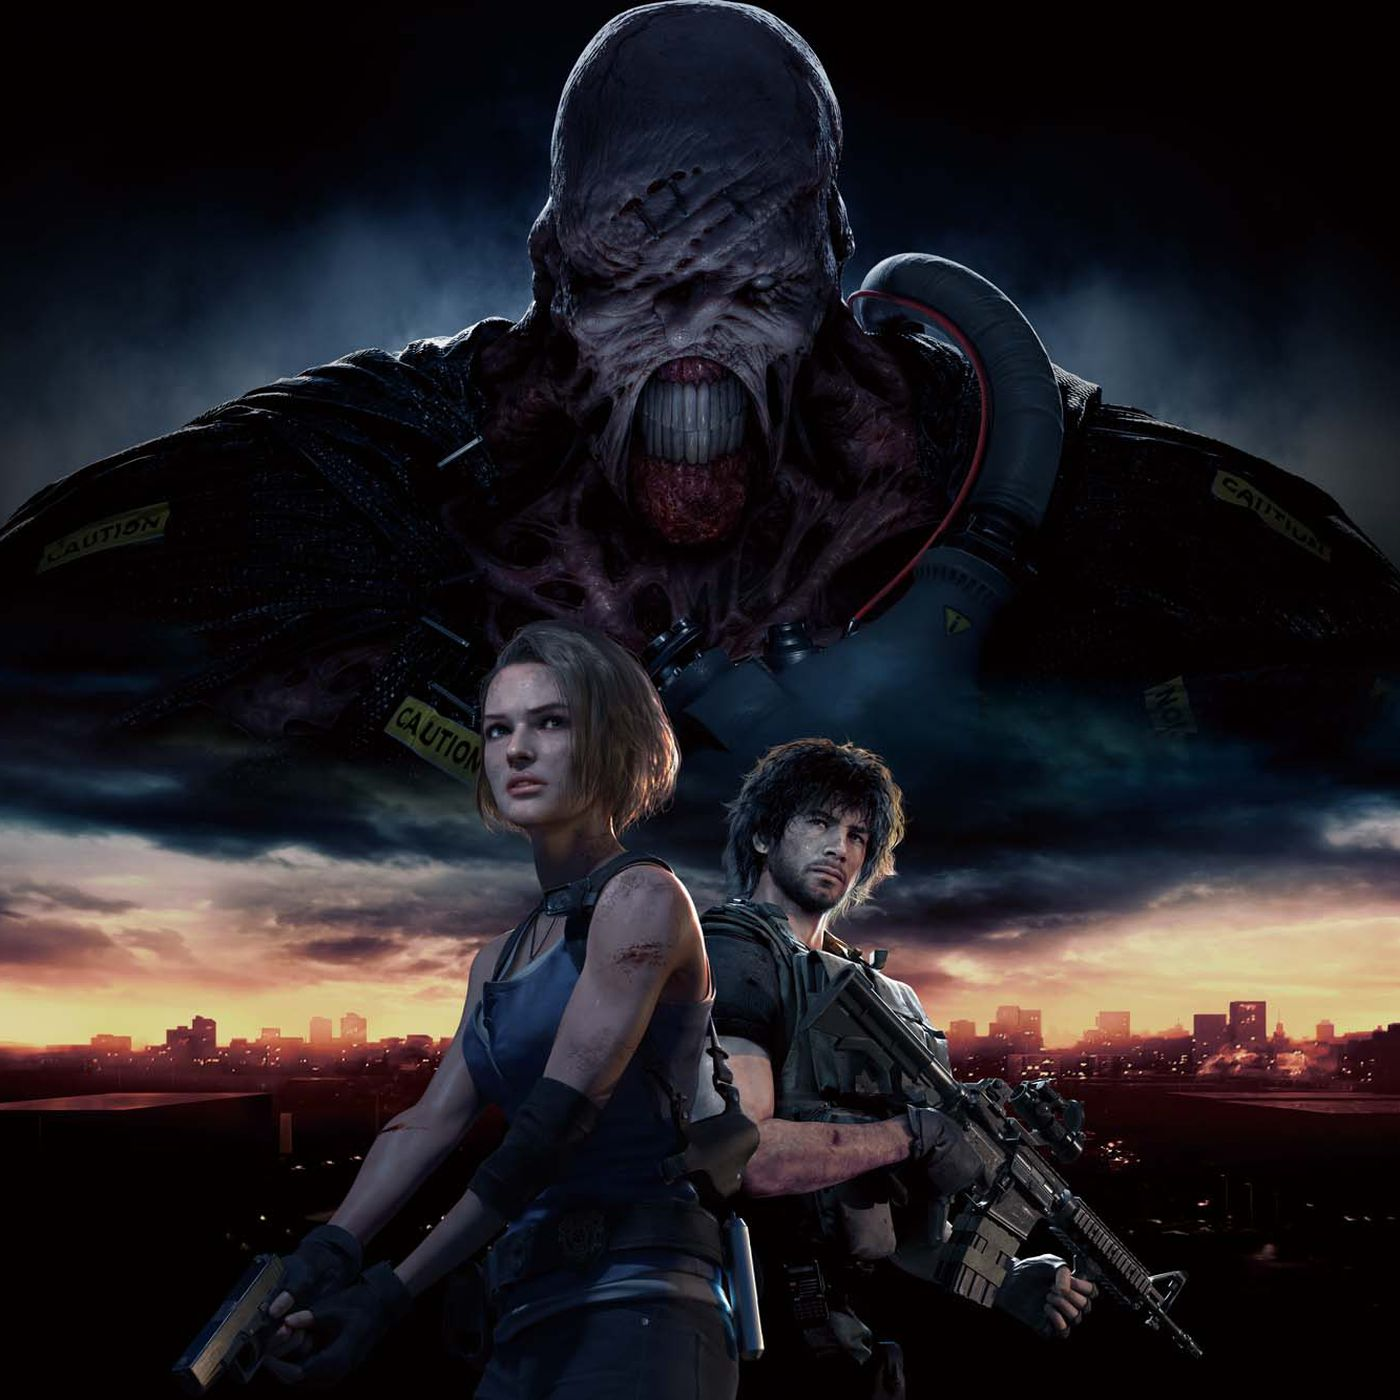 Nemesis Terrifying Growl A Resident Evil 3 Teaser Now Haunts The Re2 Remake Polygon